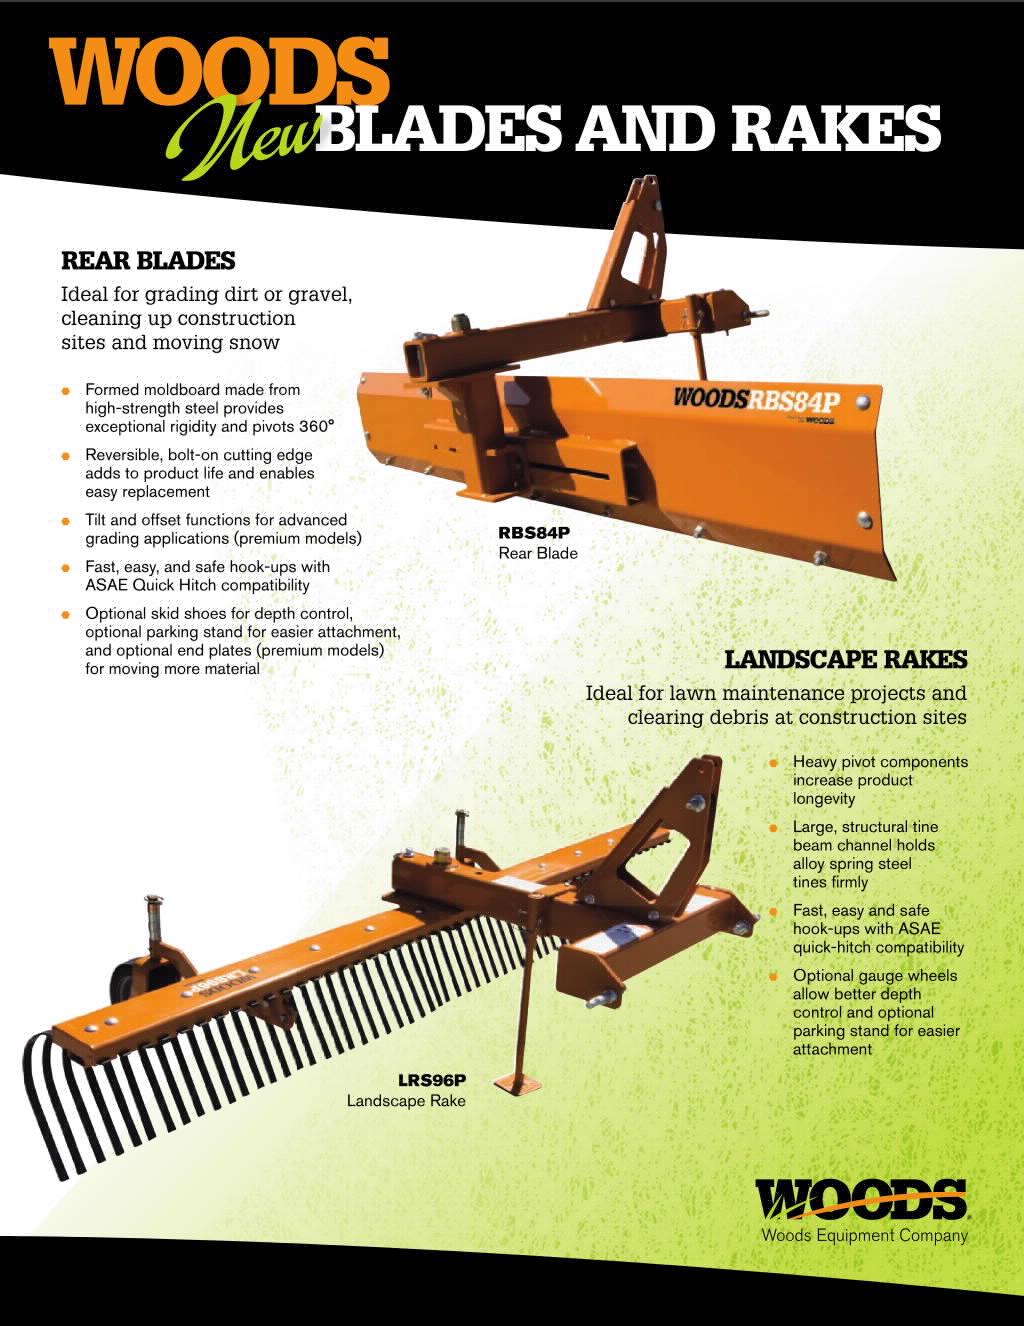 Blades and Rakes Brochure